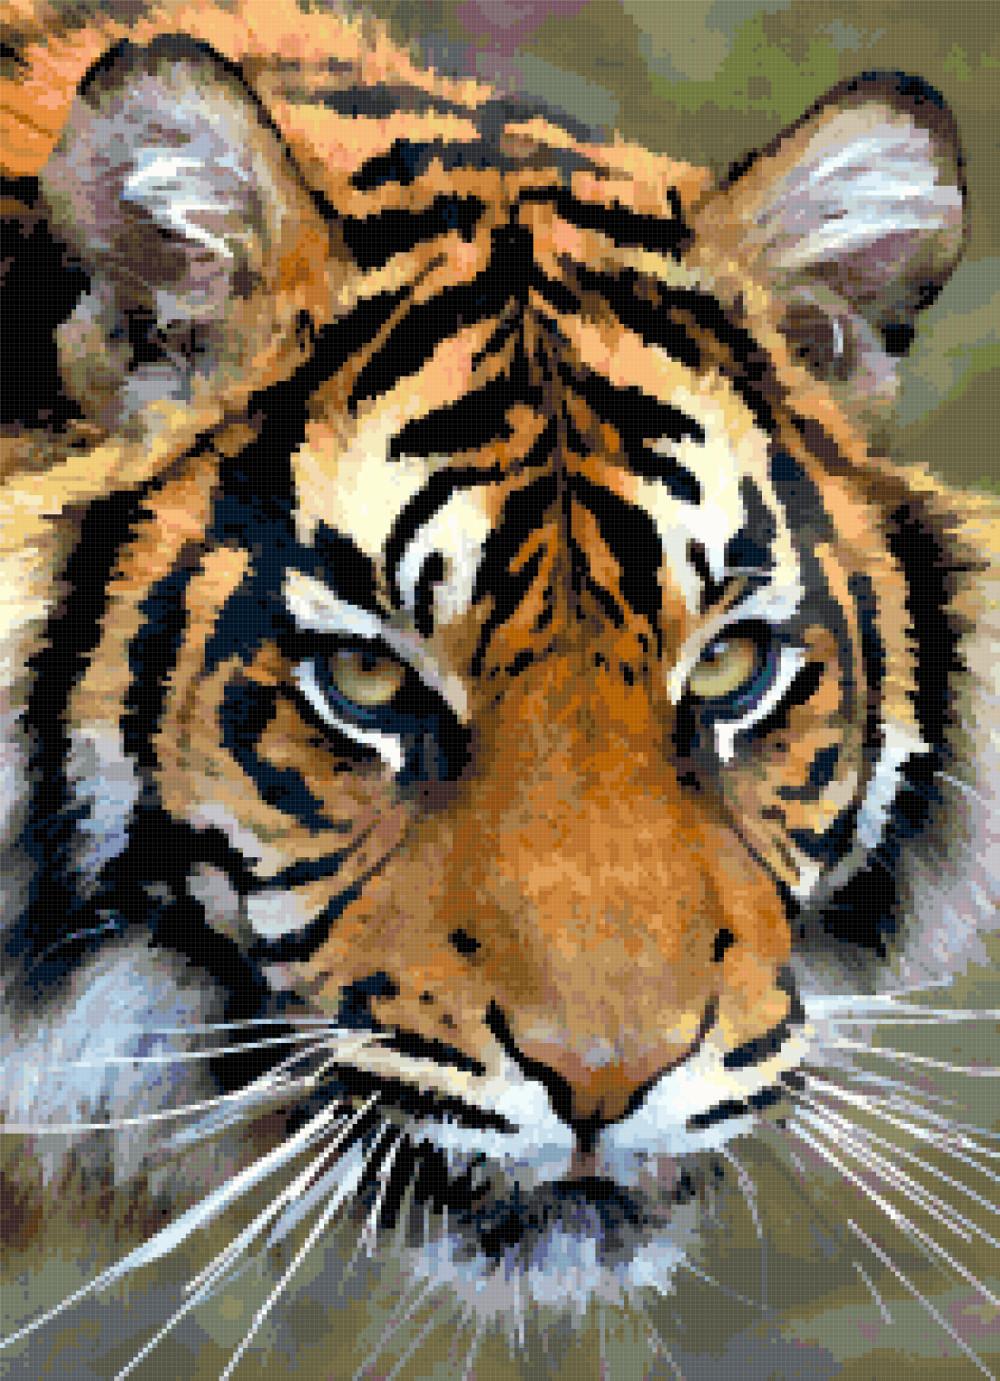 tiger look cross stitch image